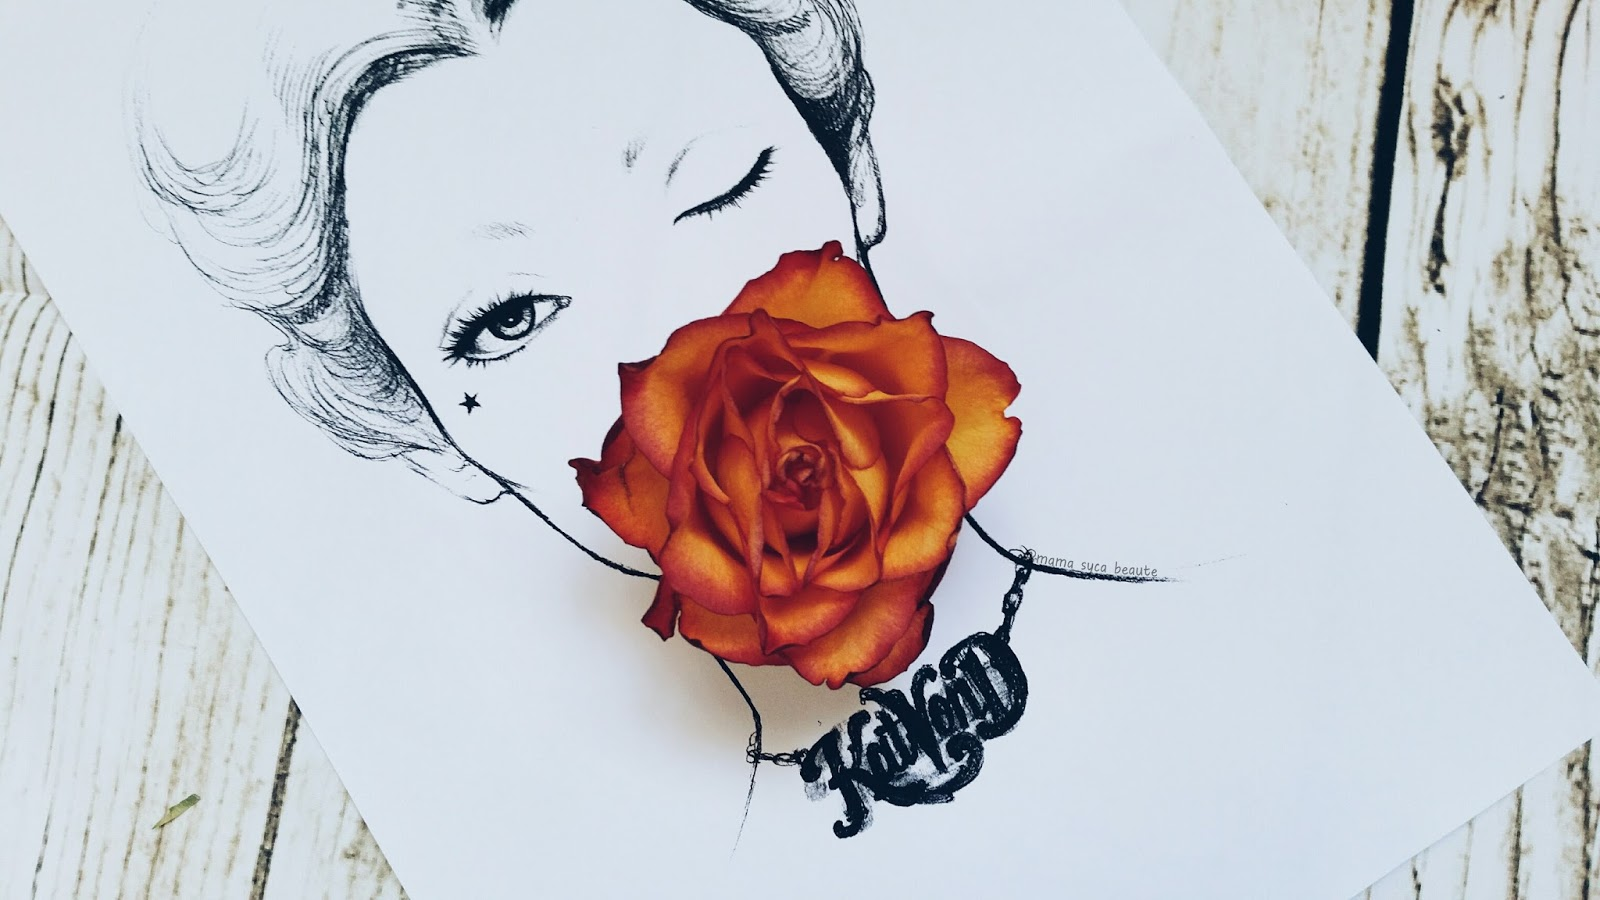 face-chart-kat-von-d-france-mama-syca-beaute